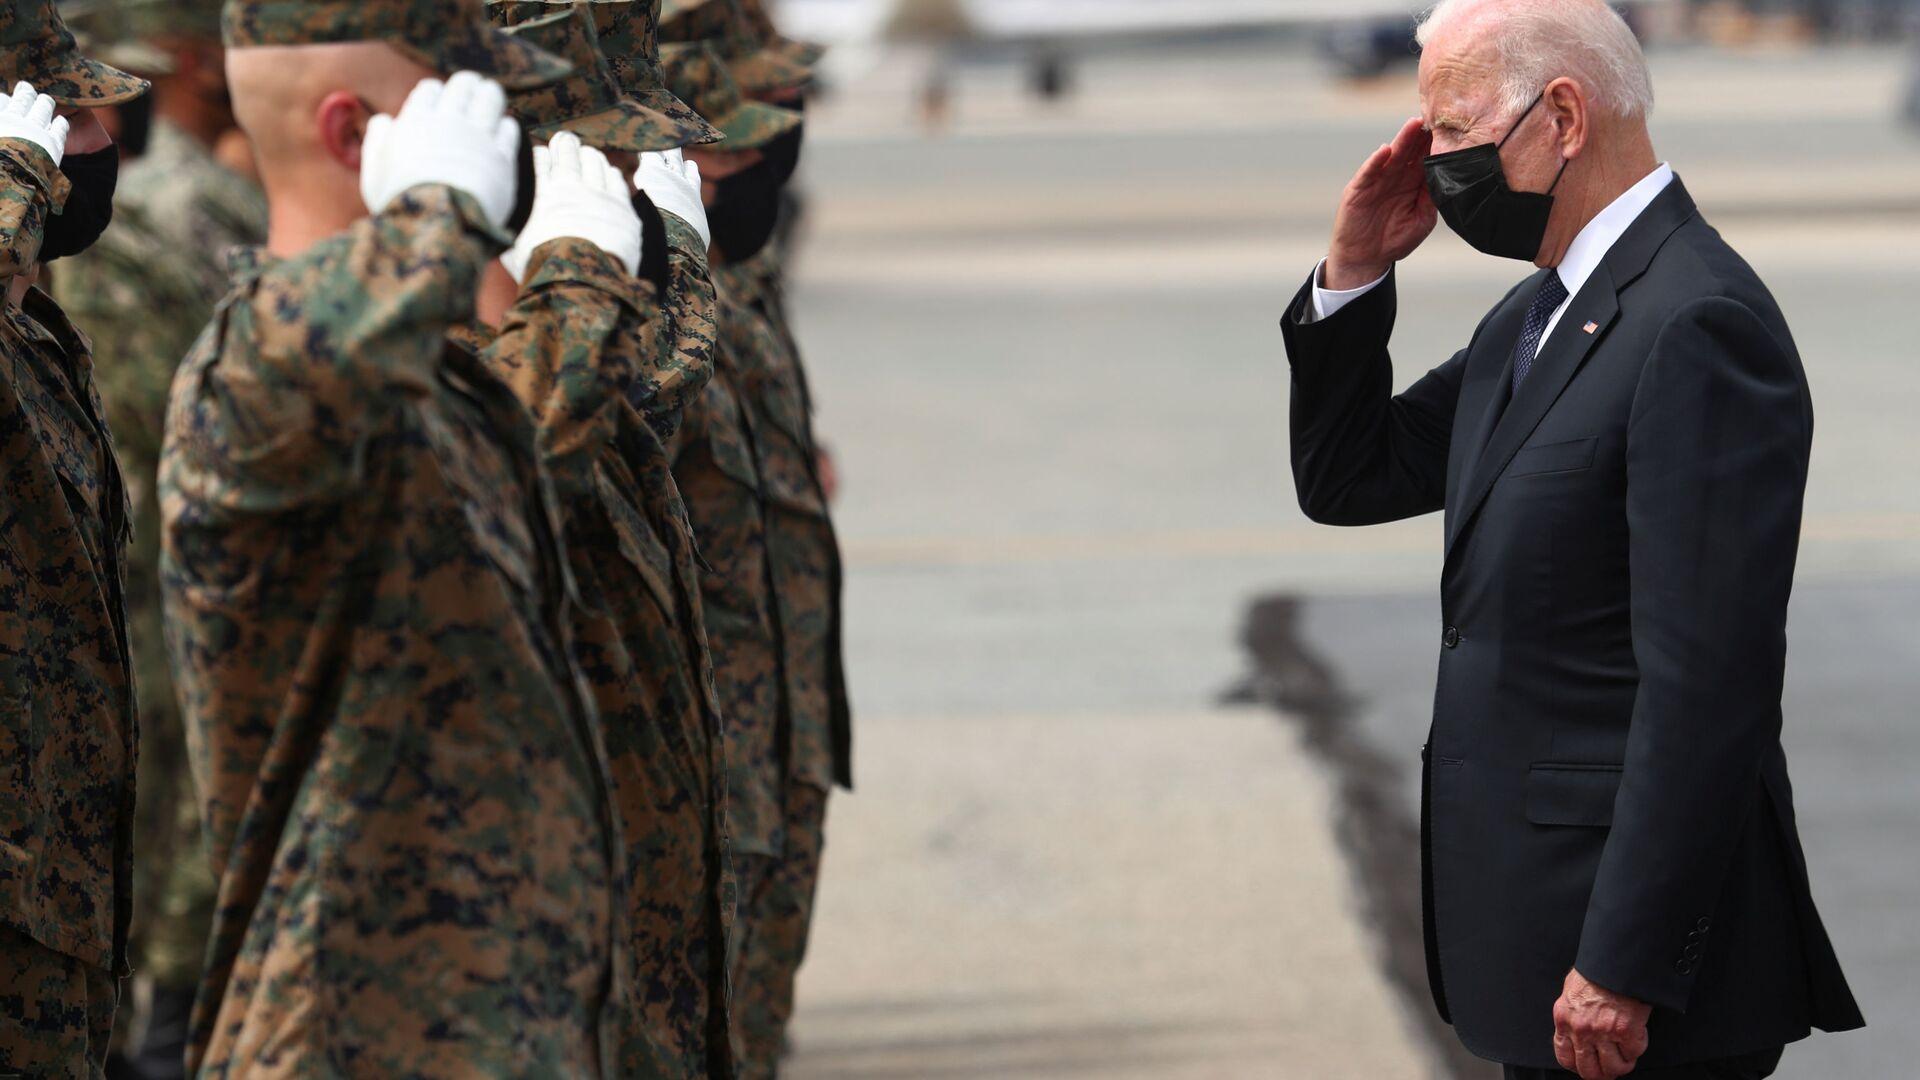 U.S. President Joe Biden salutes members of the U.S. Marine Corps Honor Guard before boarding Air Force One at Dover Air Force Base in Dover, Delaware, U.S., August 29, 2021 - Sputnik International, 1920, 01.09.2021